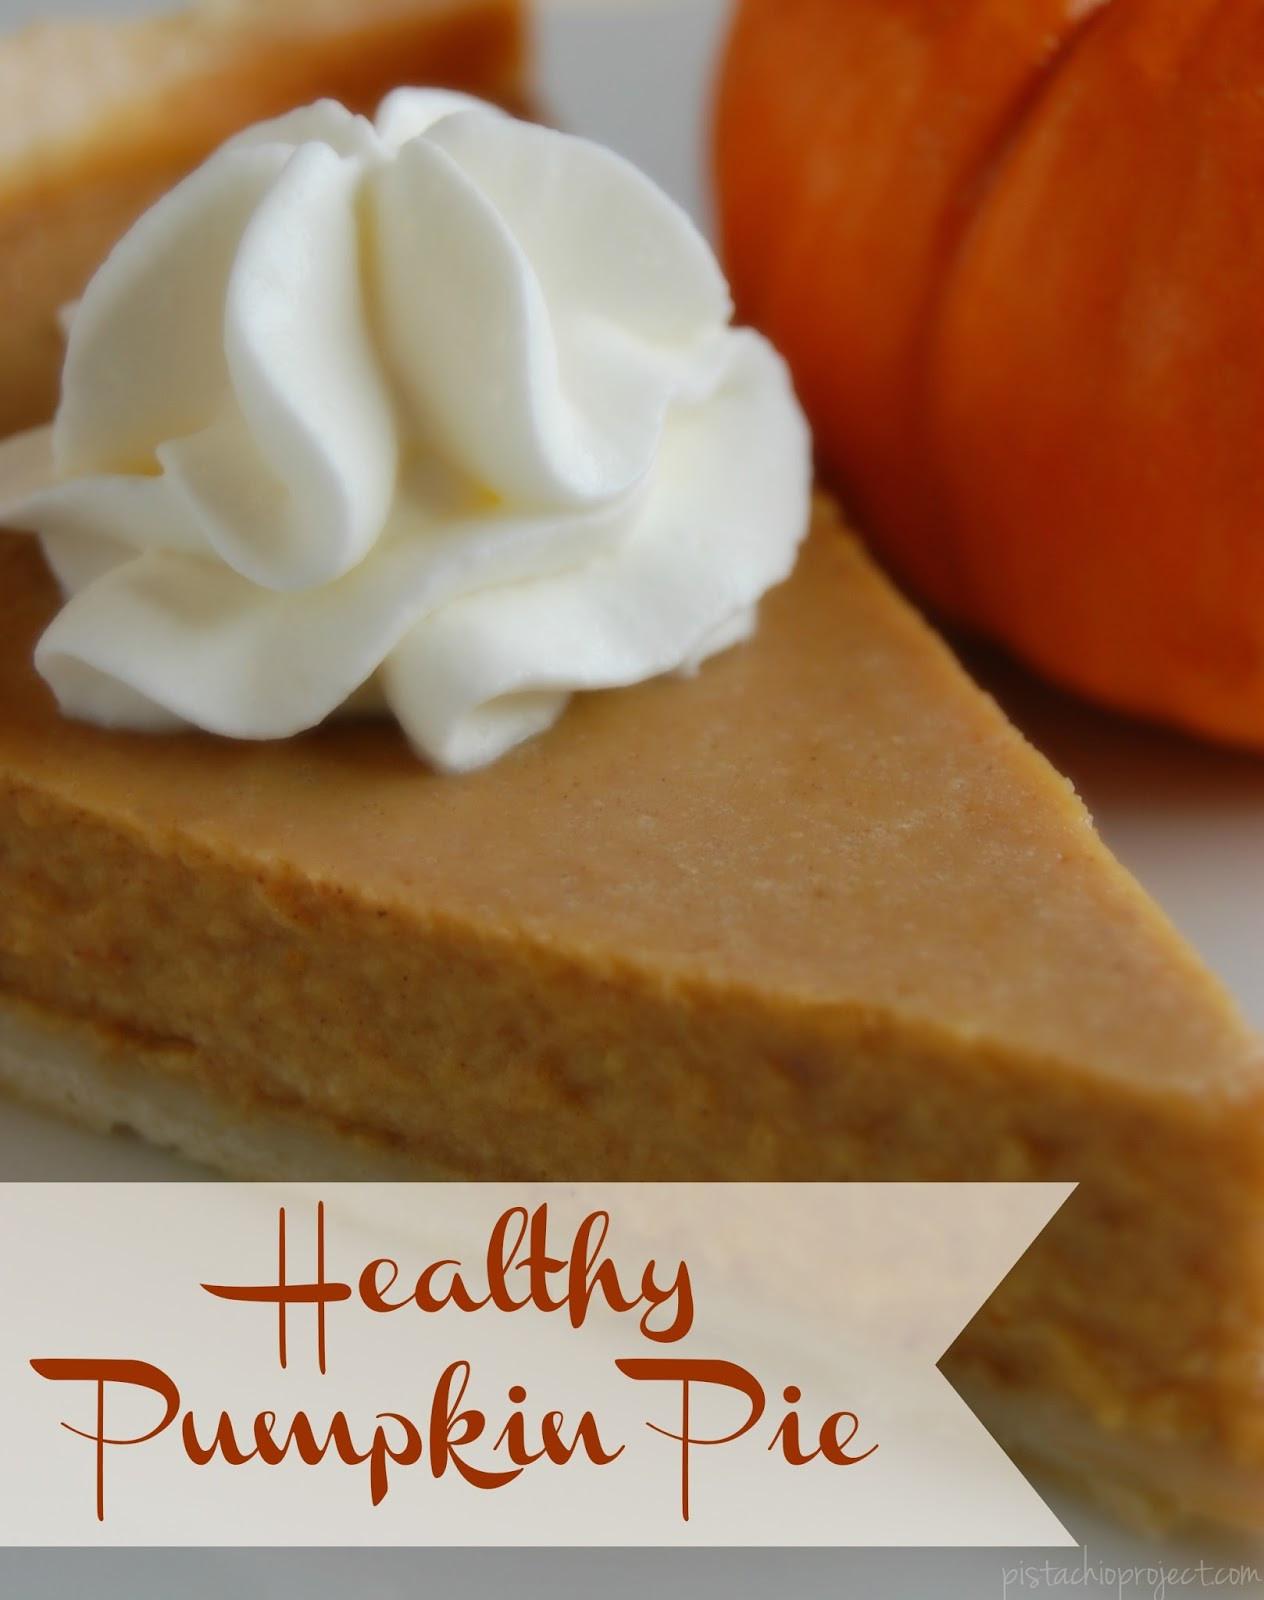 Is Pumpkin Pie Healthy  Healthy Pumpkin Pie The Pistachio Project